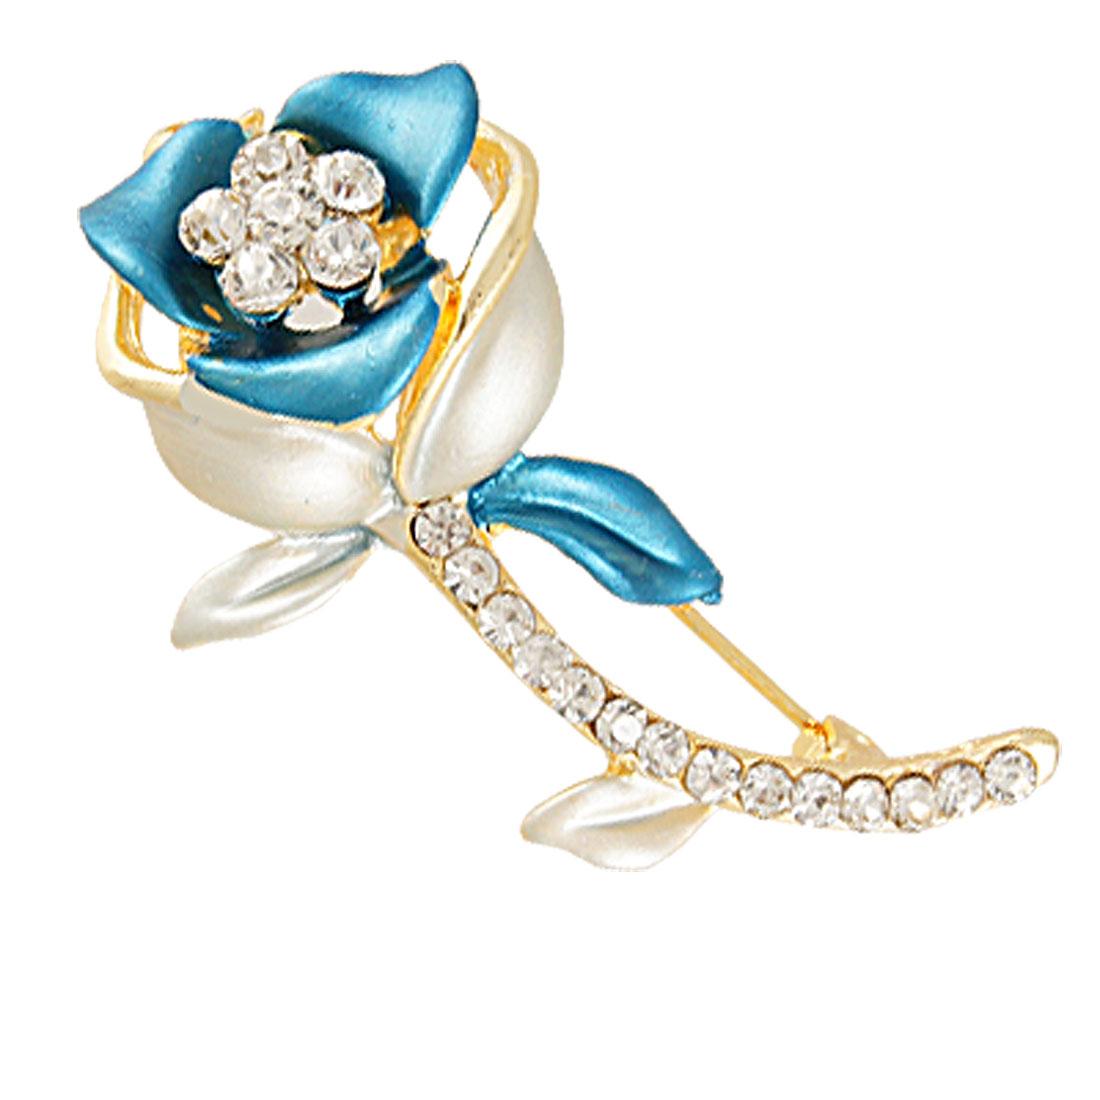 Lady Rhinestone Detail Indigo Blue Rose Flower Pin Closure Brooch